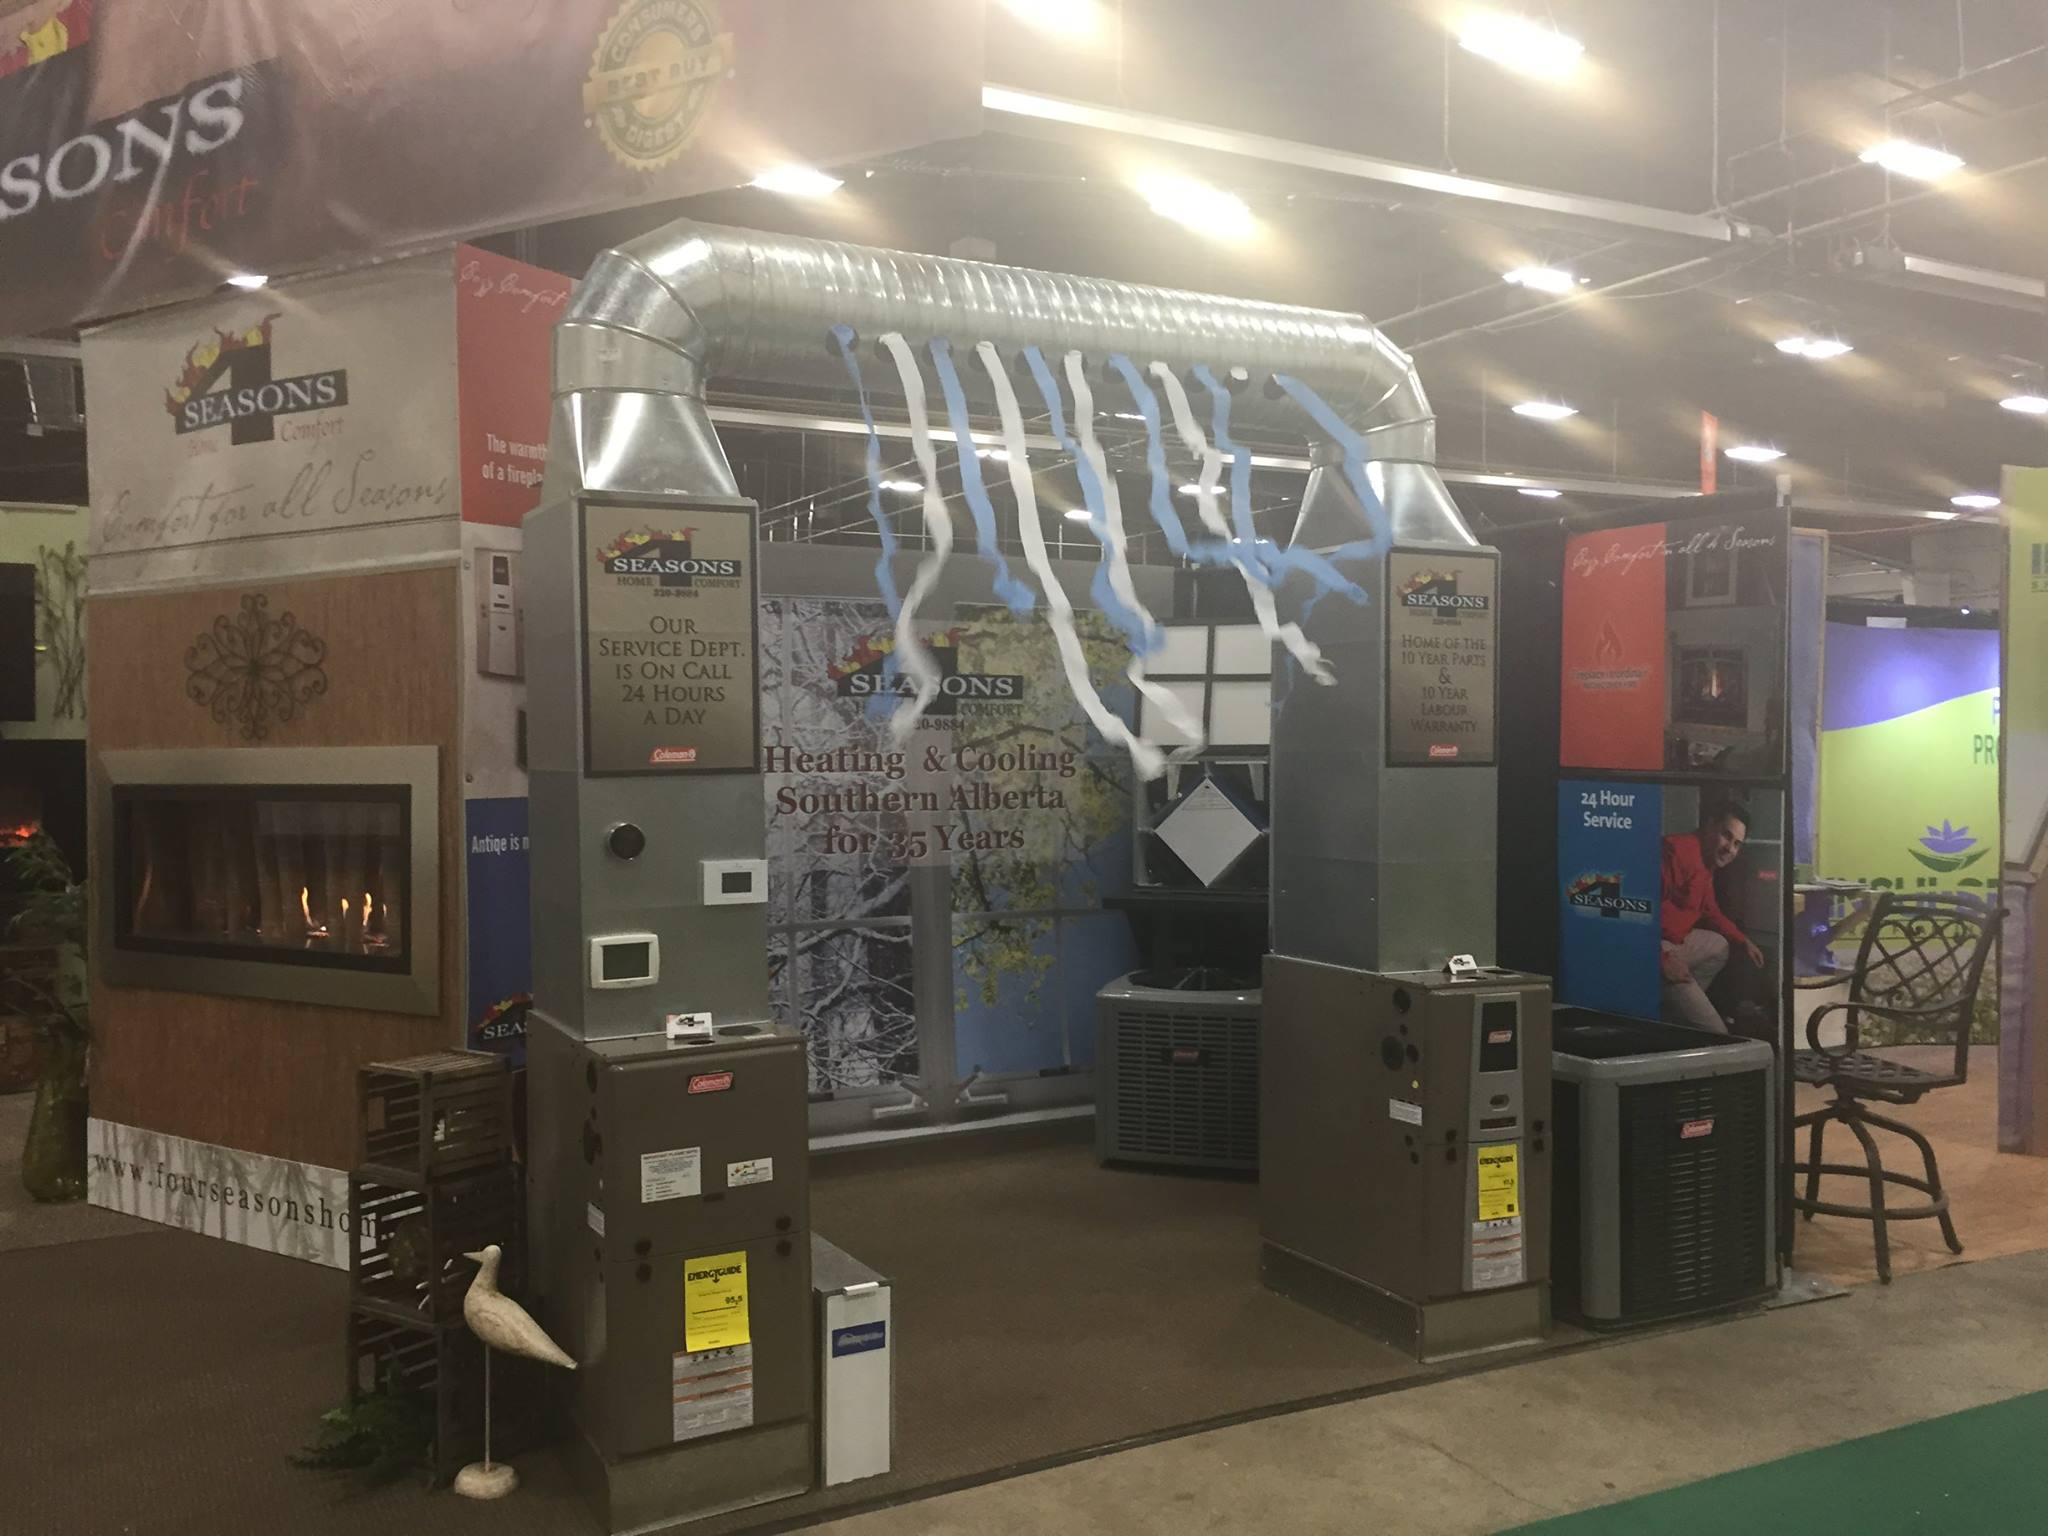 4 Seasons - Commercial HVAC system